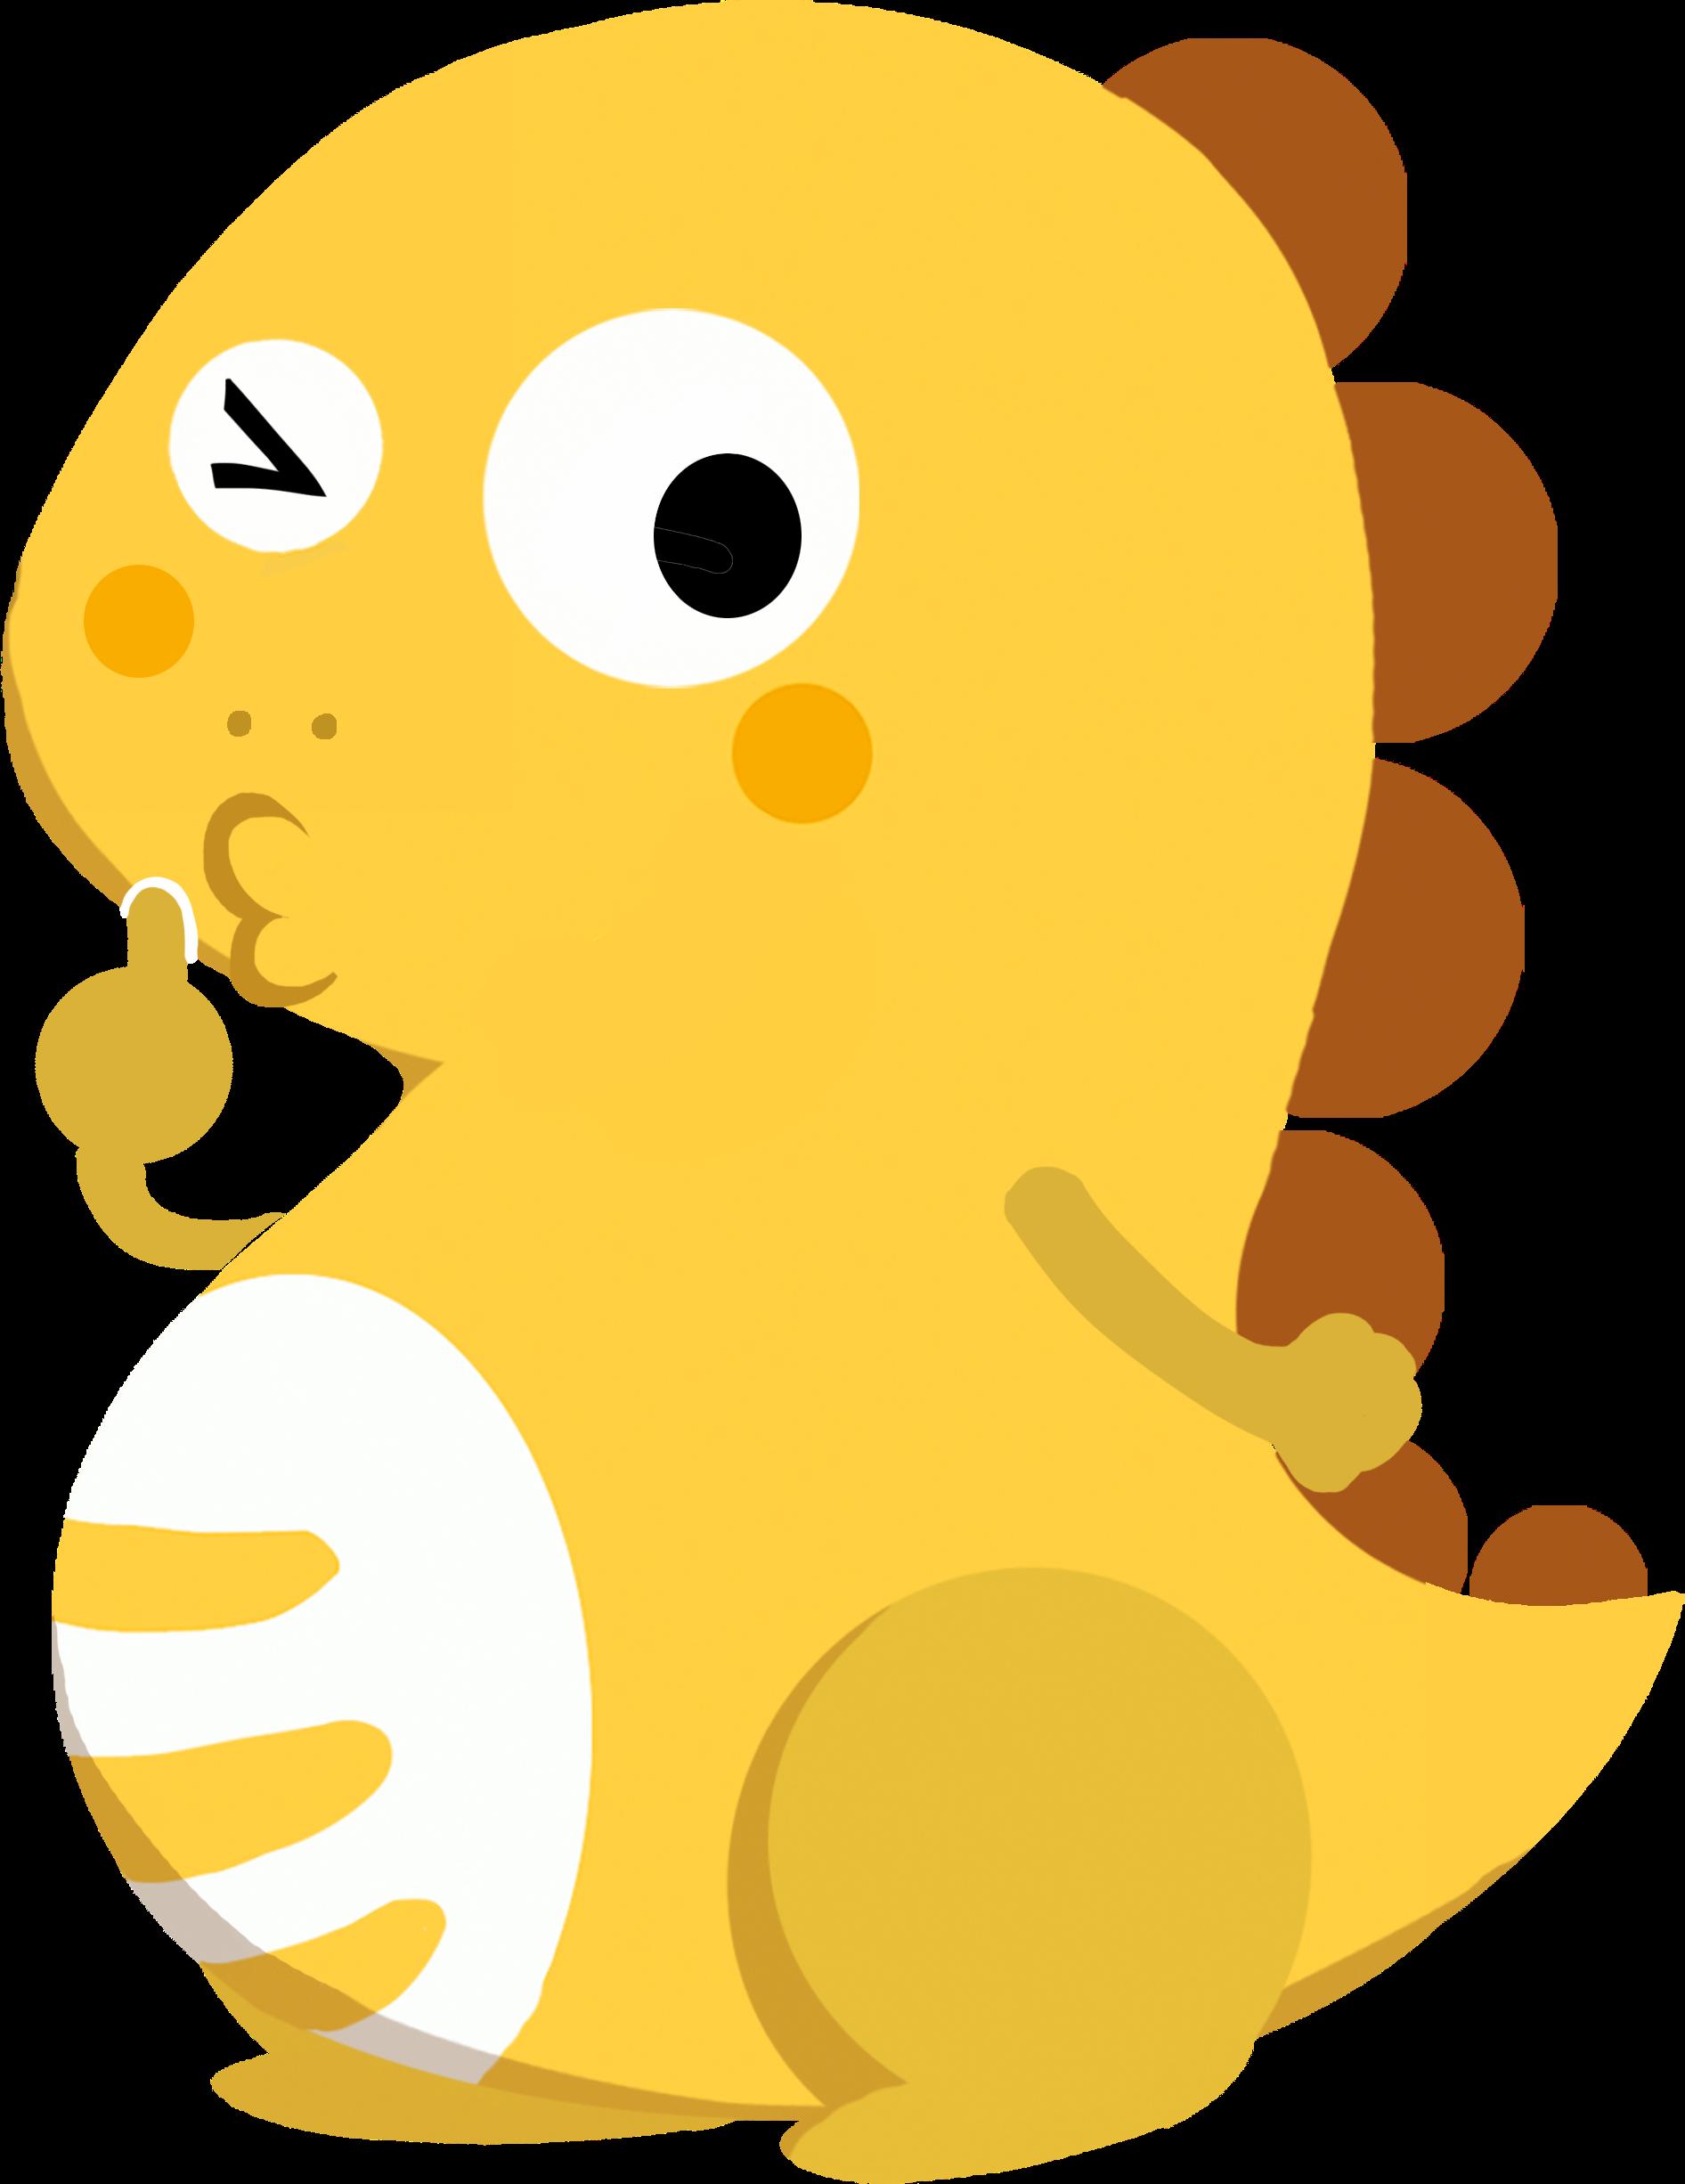 graphic regarding Vipkid Dino Printable named Tinas Fave Applications, Props Tools Your VIPKid Trip